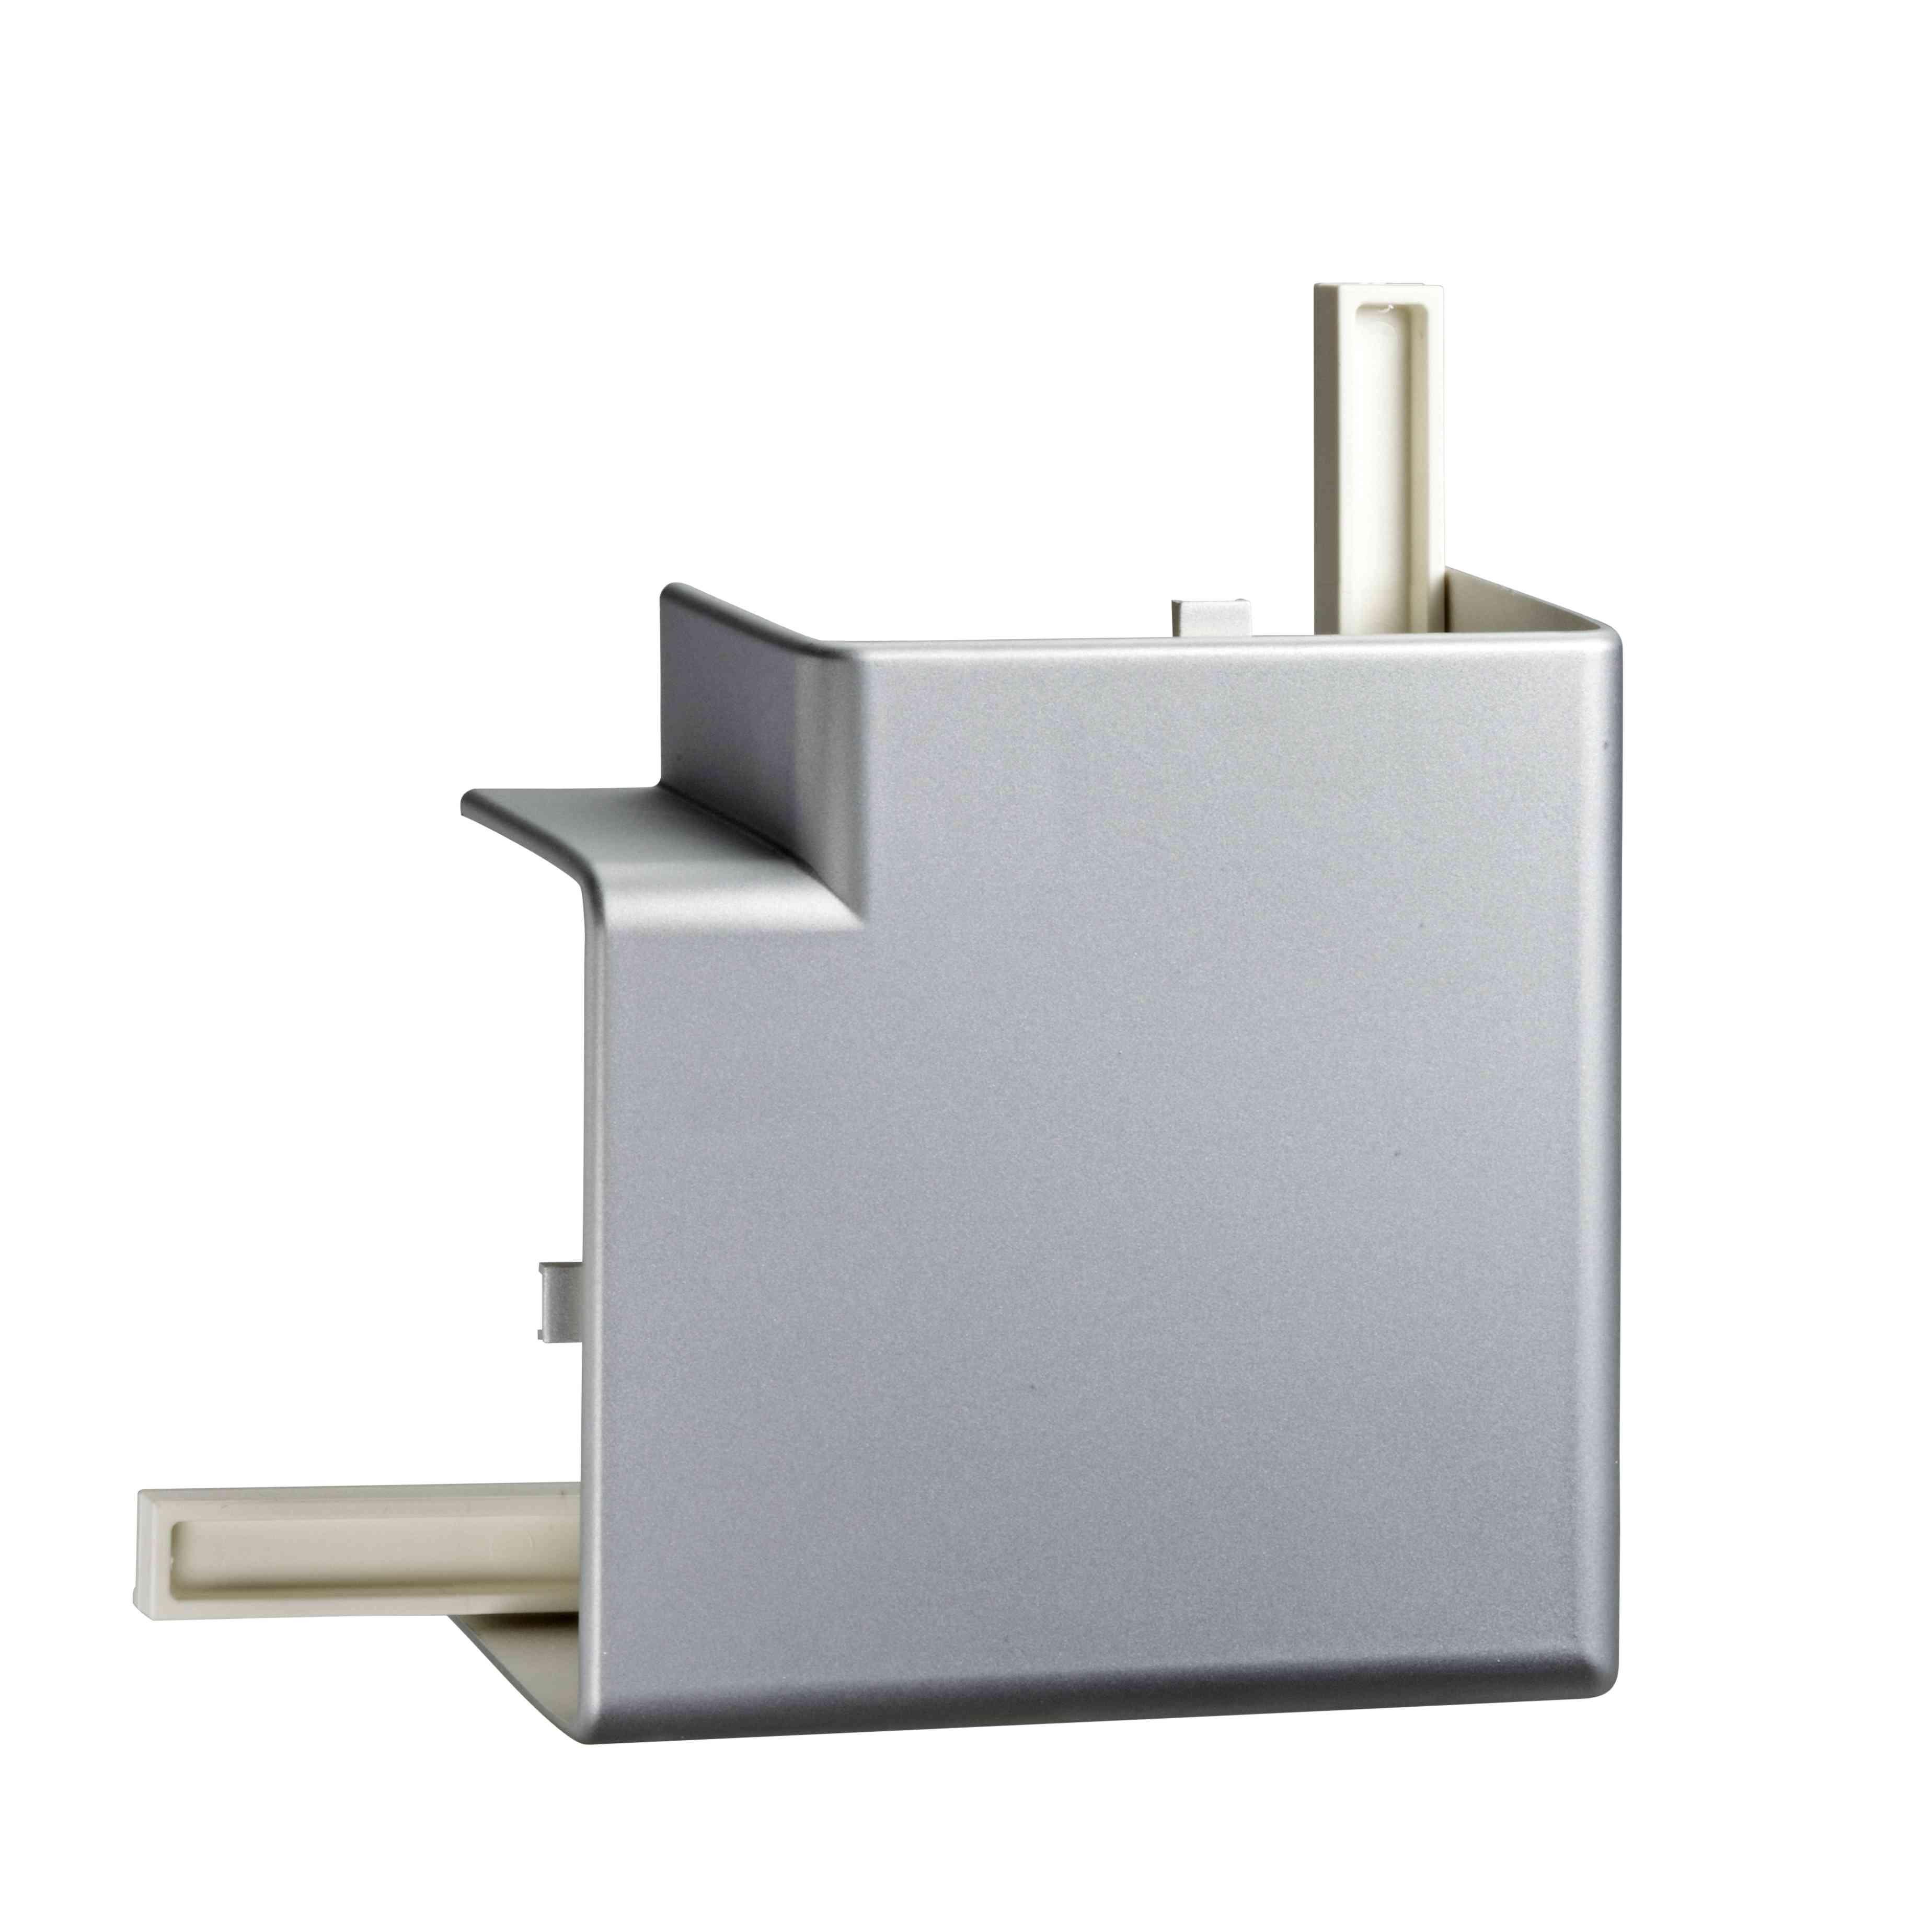 OptiLine 45 - upognjen 90° - PC/ABS - kovinsko